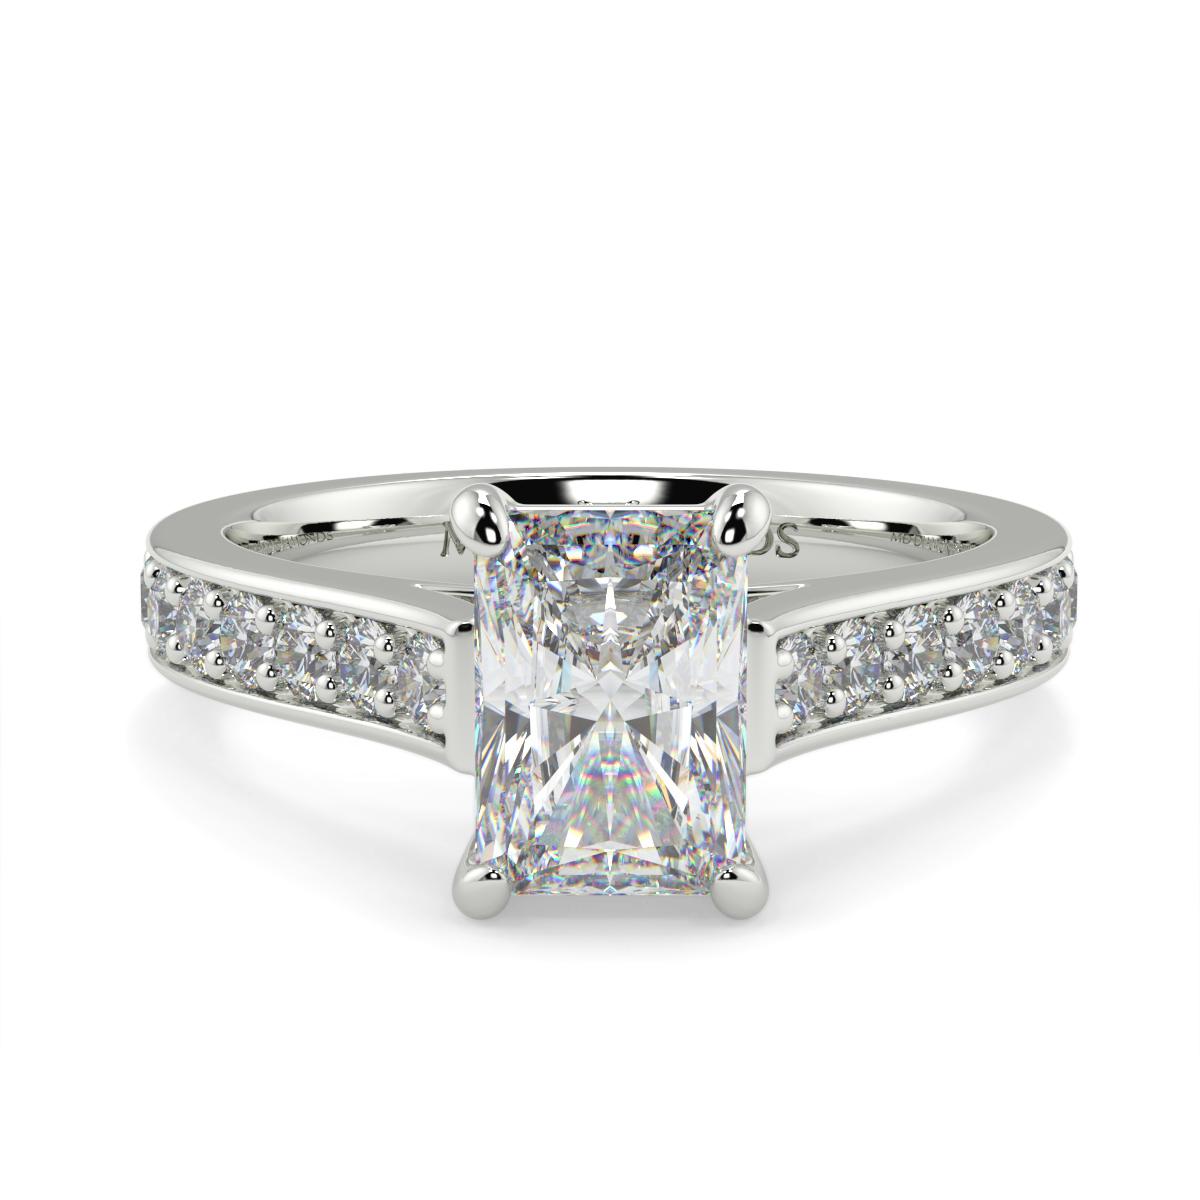 Radiant Pave Set Diamond Ring